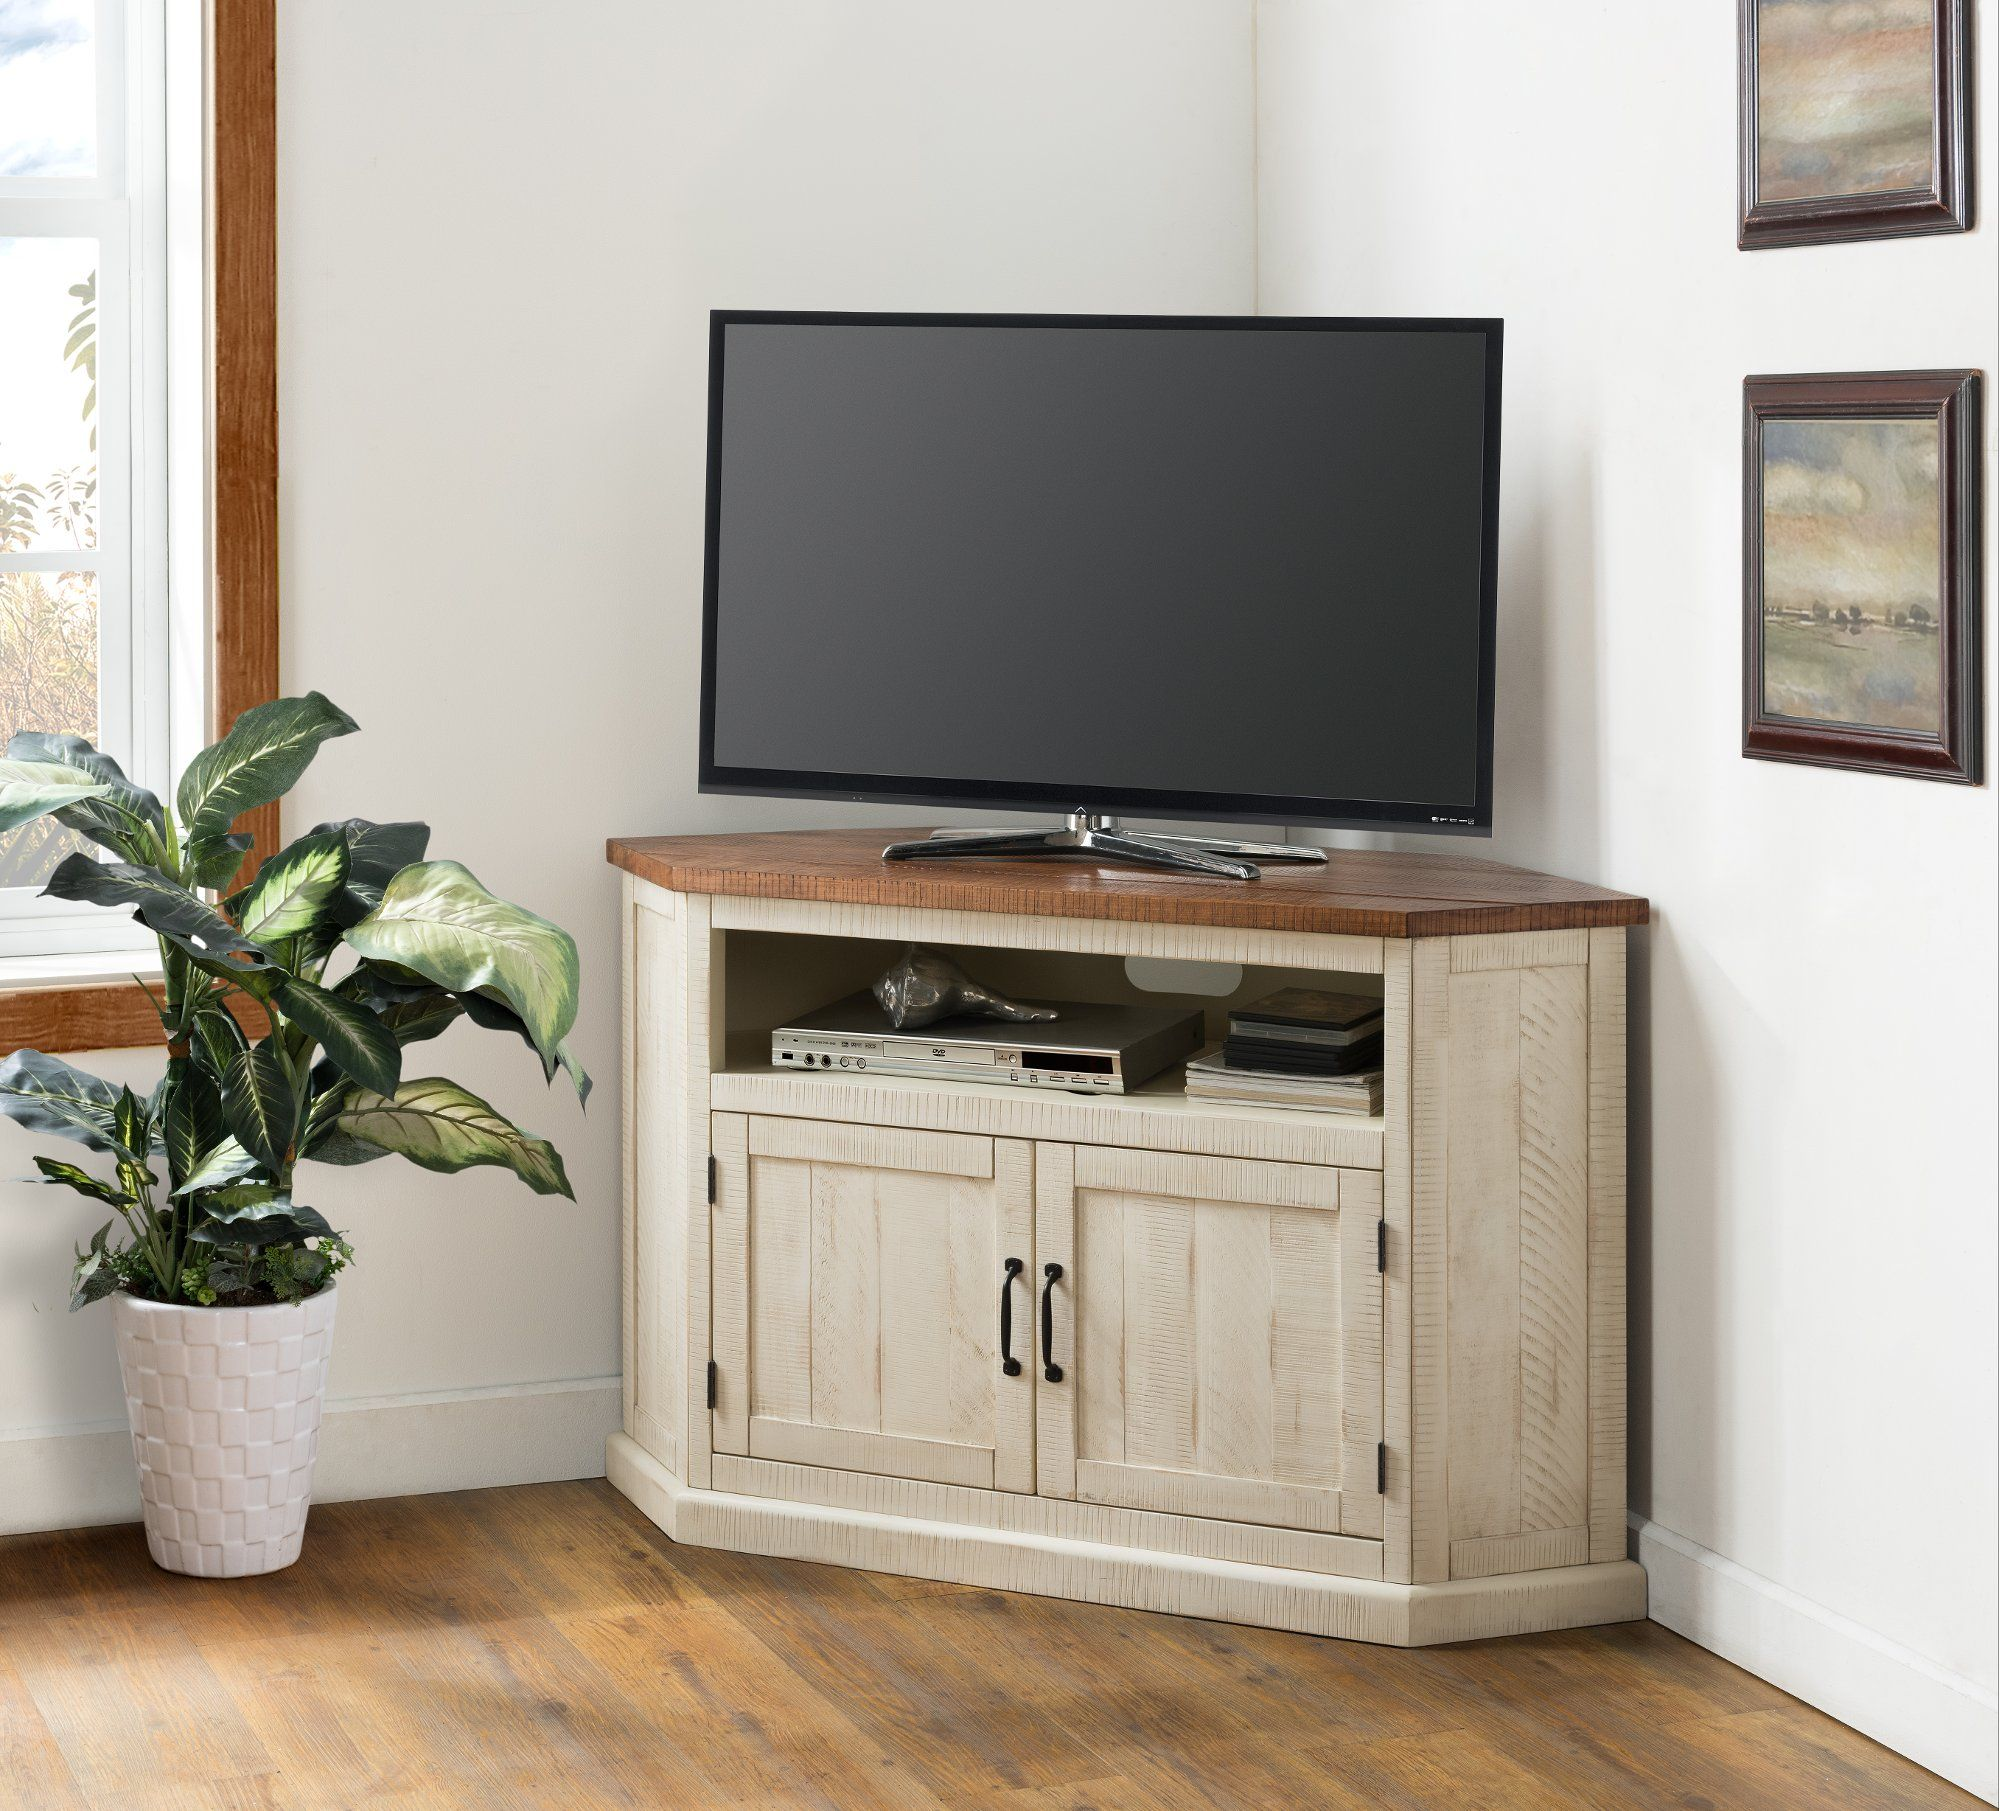 White Wash And Pine Corner Tv Stand Rustic In 2020 Wood Corner